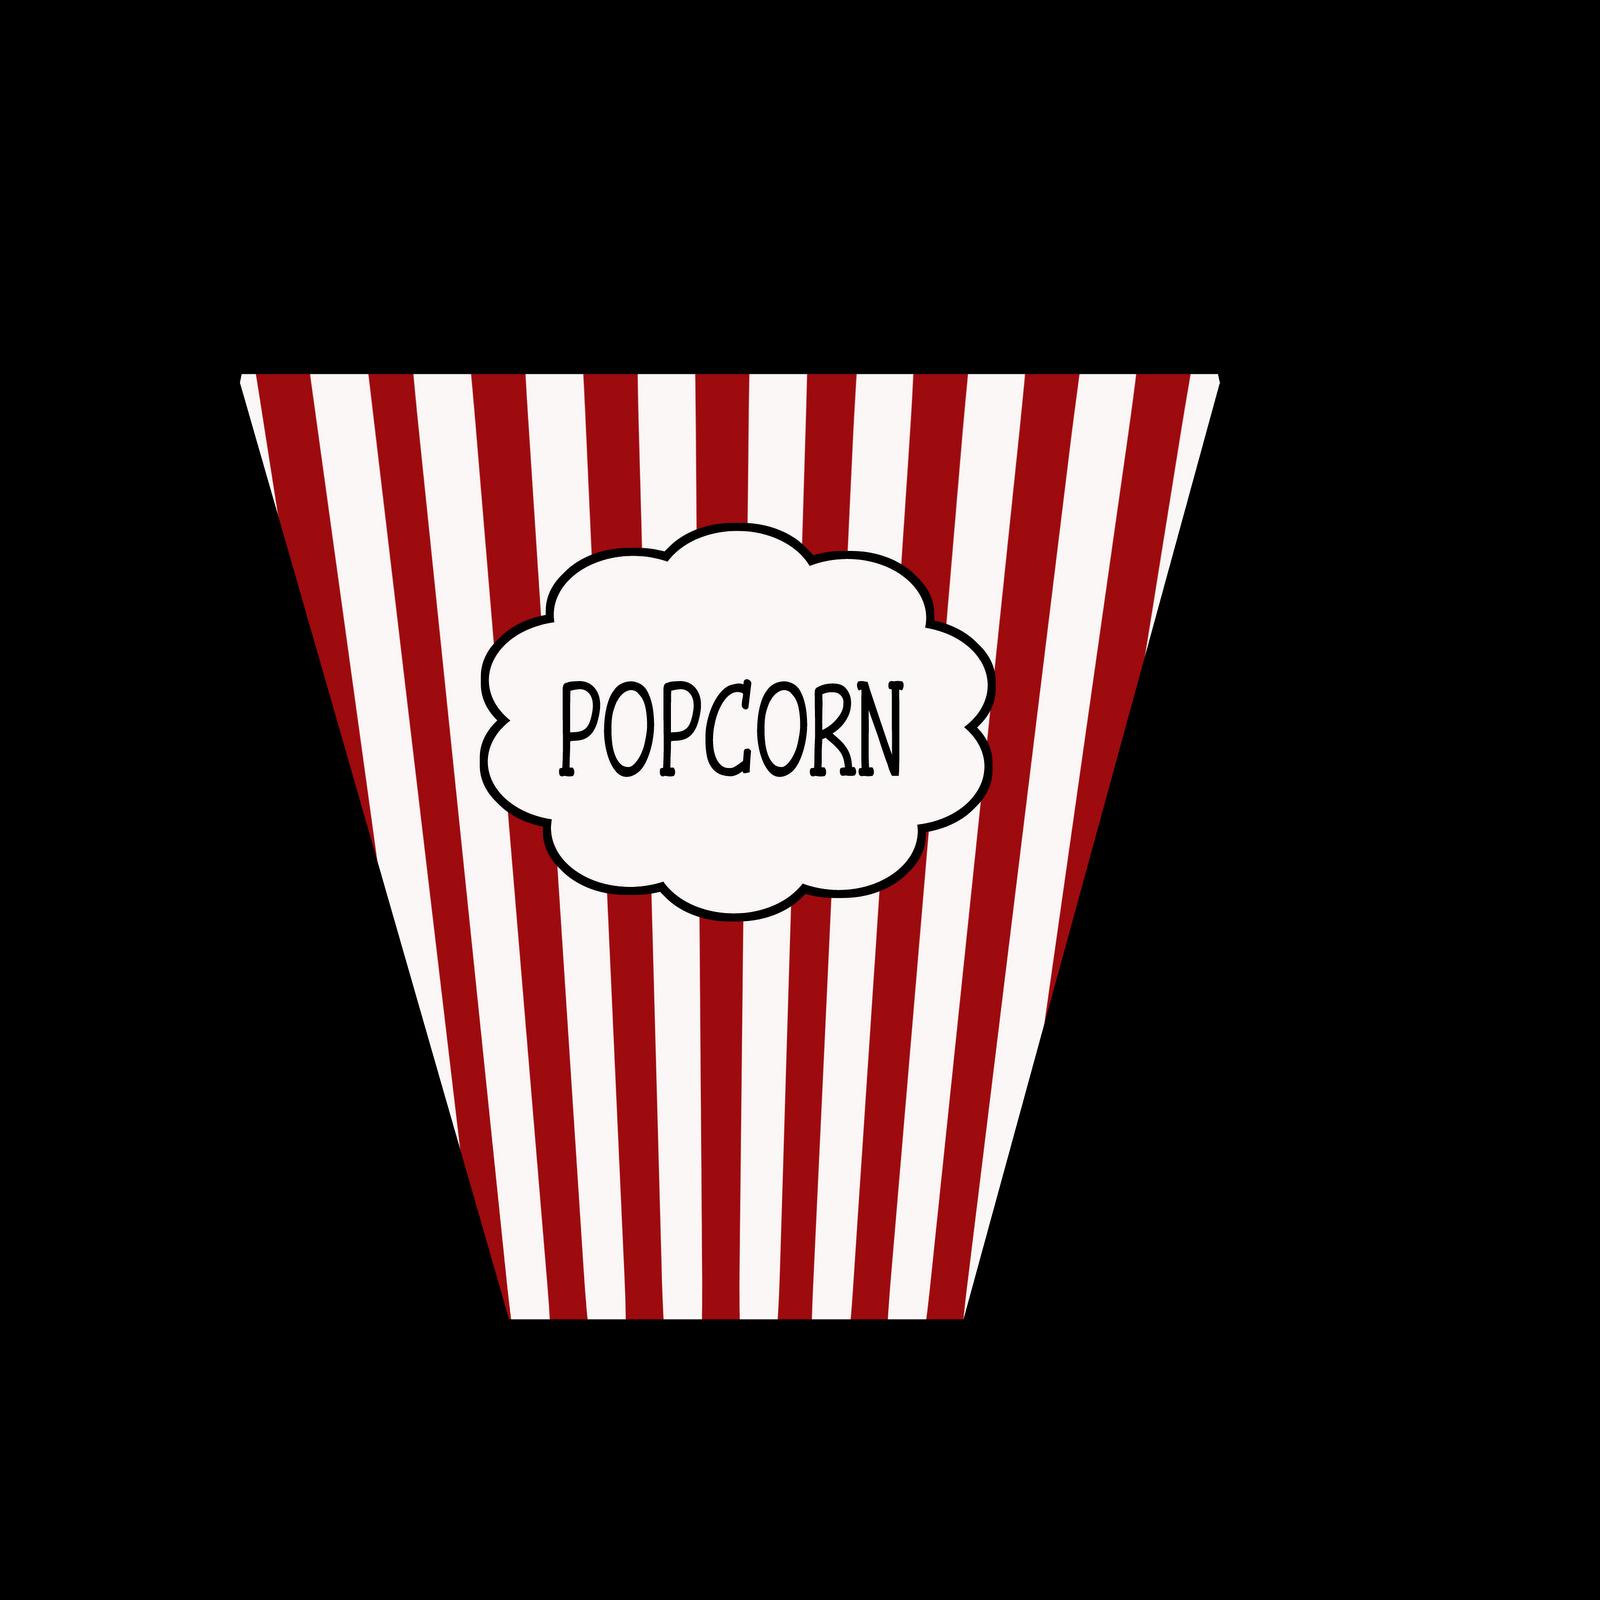 Clip art popcorn dayasriola. Dog clipart easy